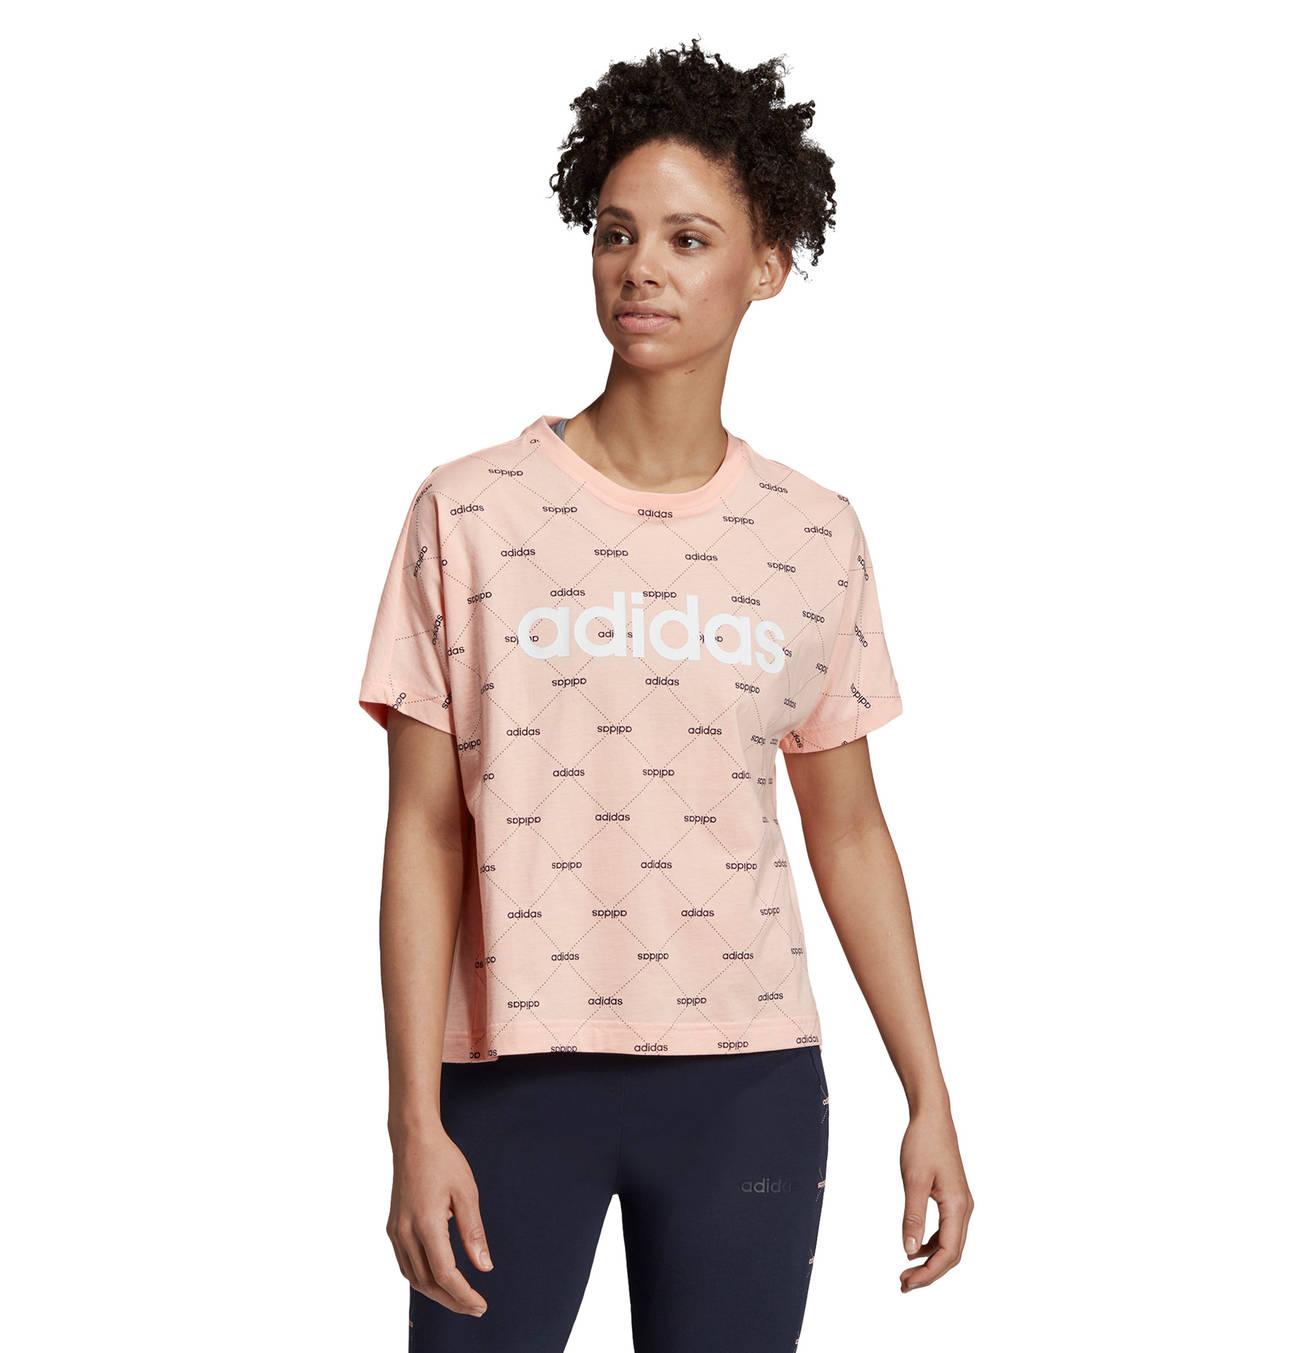 T Shirt Linear Graphic Rauten Muster Logo Print Fur Damen Baumwolle Shirts T Shirt